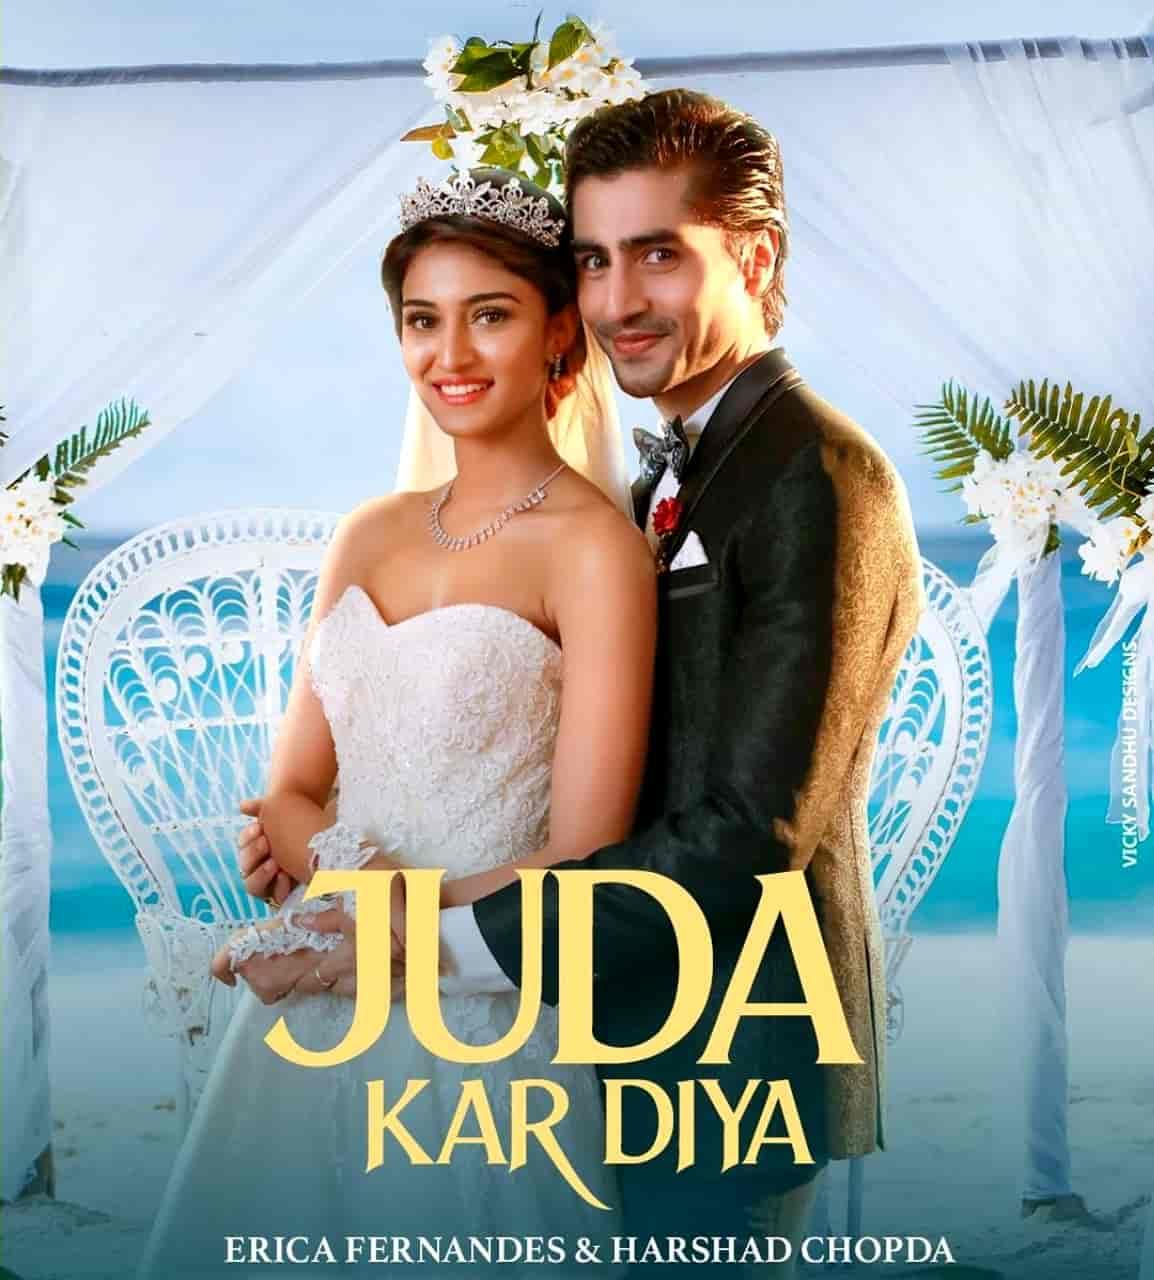 Juda Kar Diya Hindi Song Image Features Erica Fernandes and Harshad Chopda